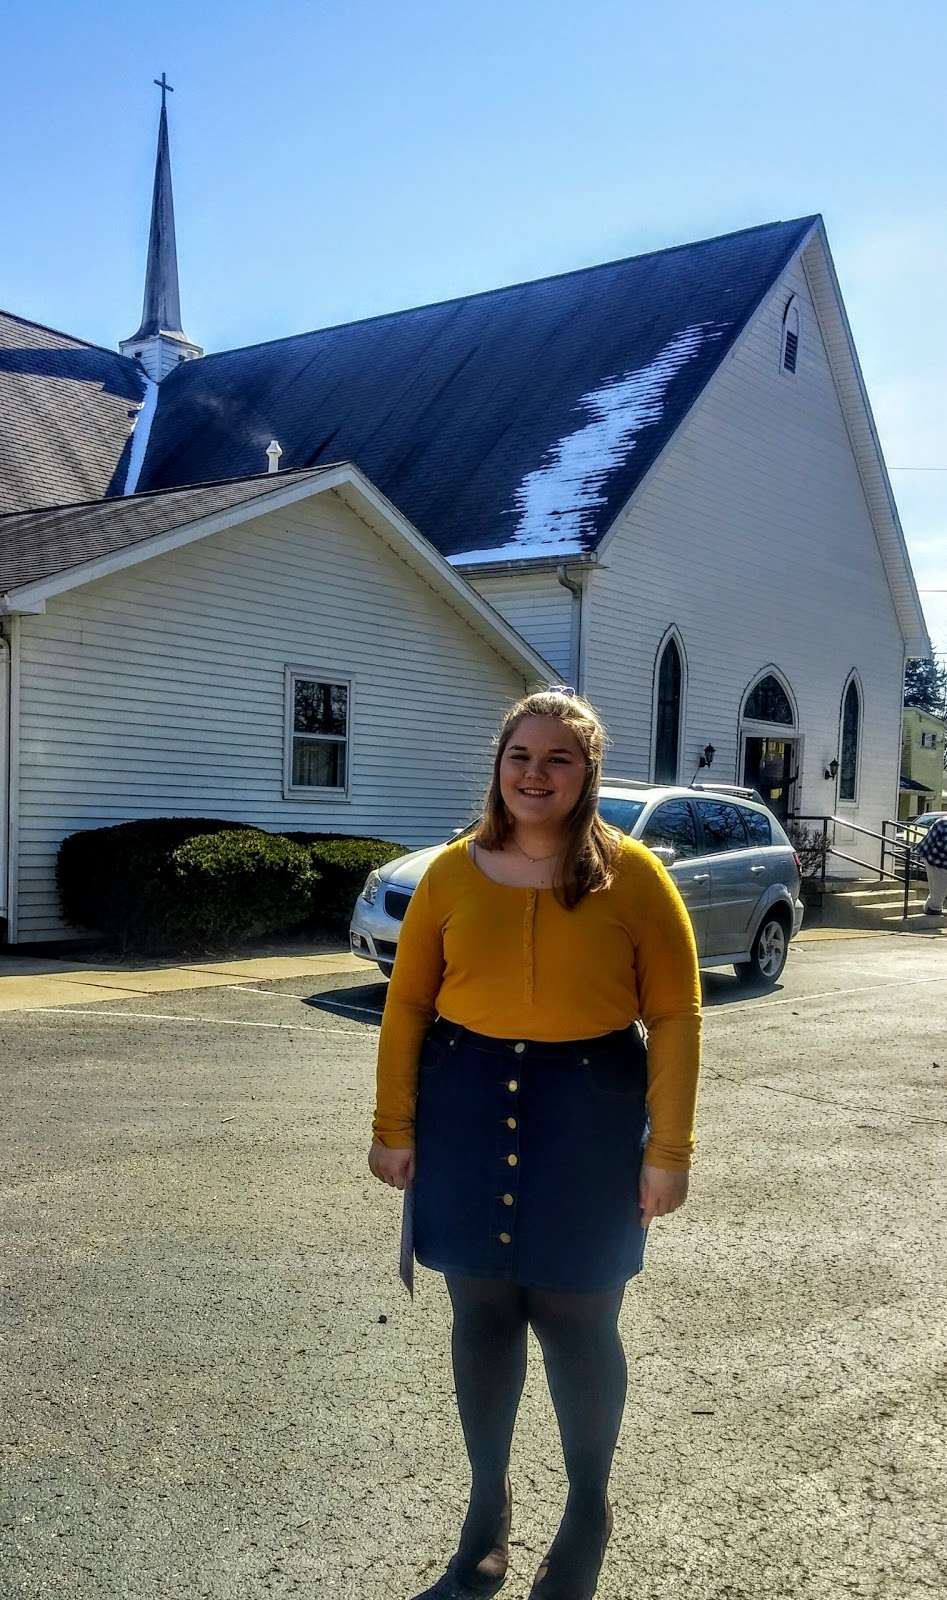 Huntsville Good Shepherd Church - church  | Photo 3 of 4 | Address: 3126 Market St, Pendleton, IN 46064, USA | Phone: (765) 778-2993